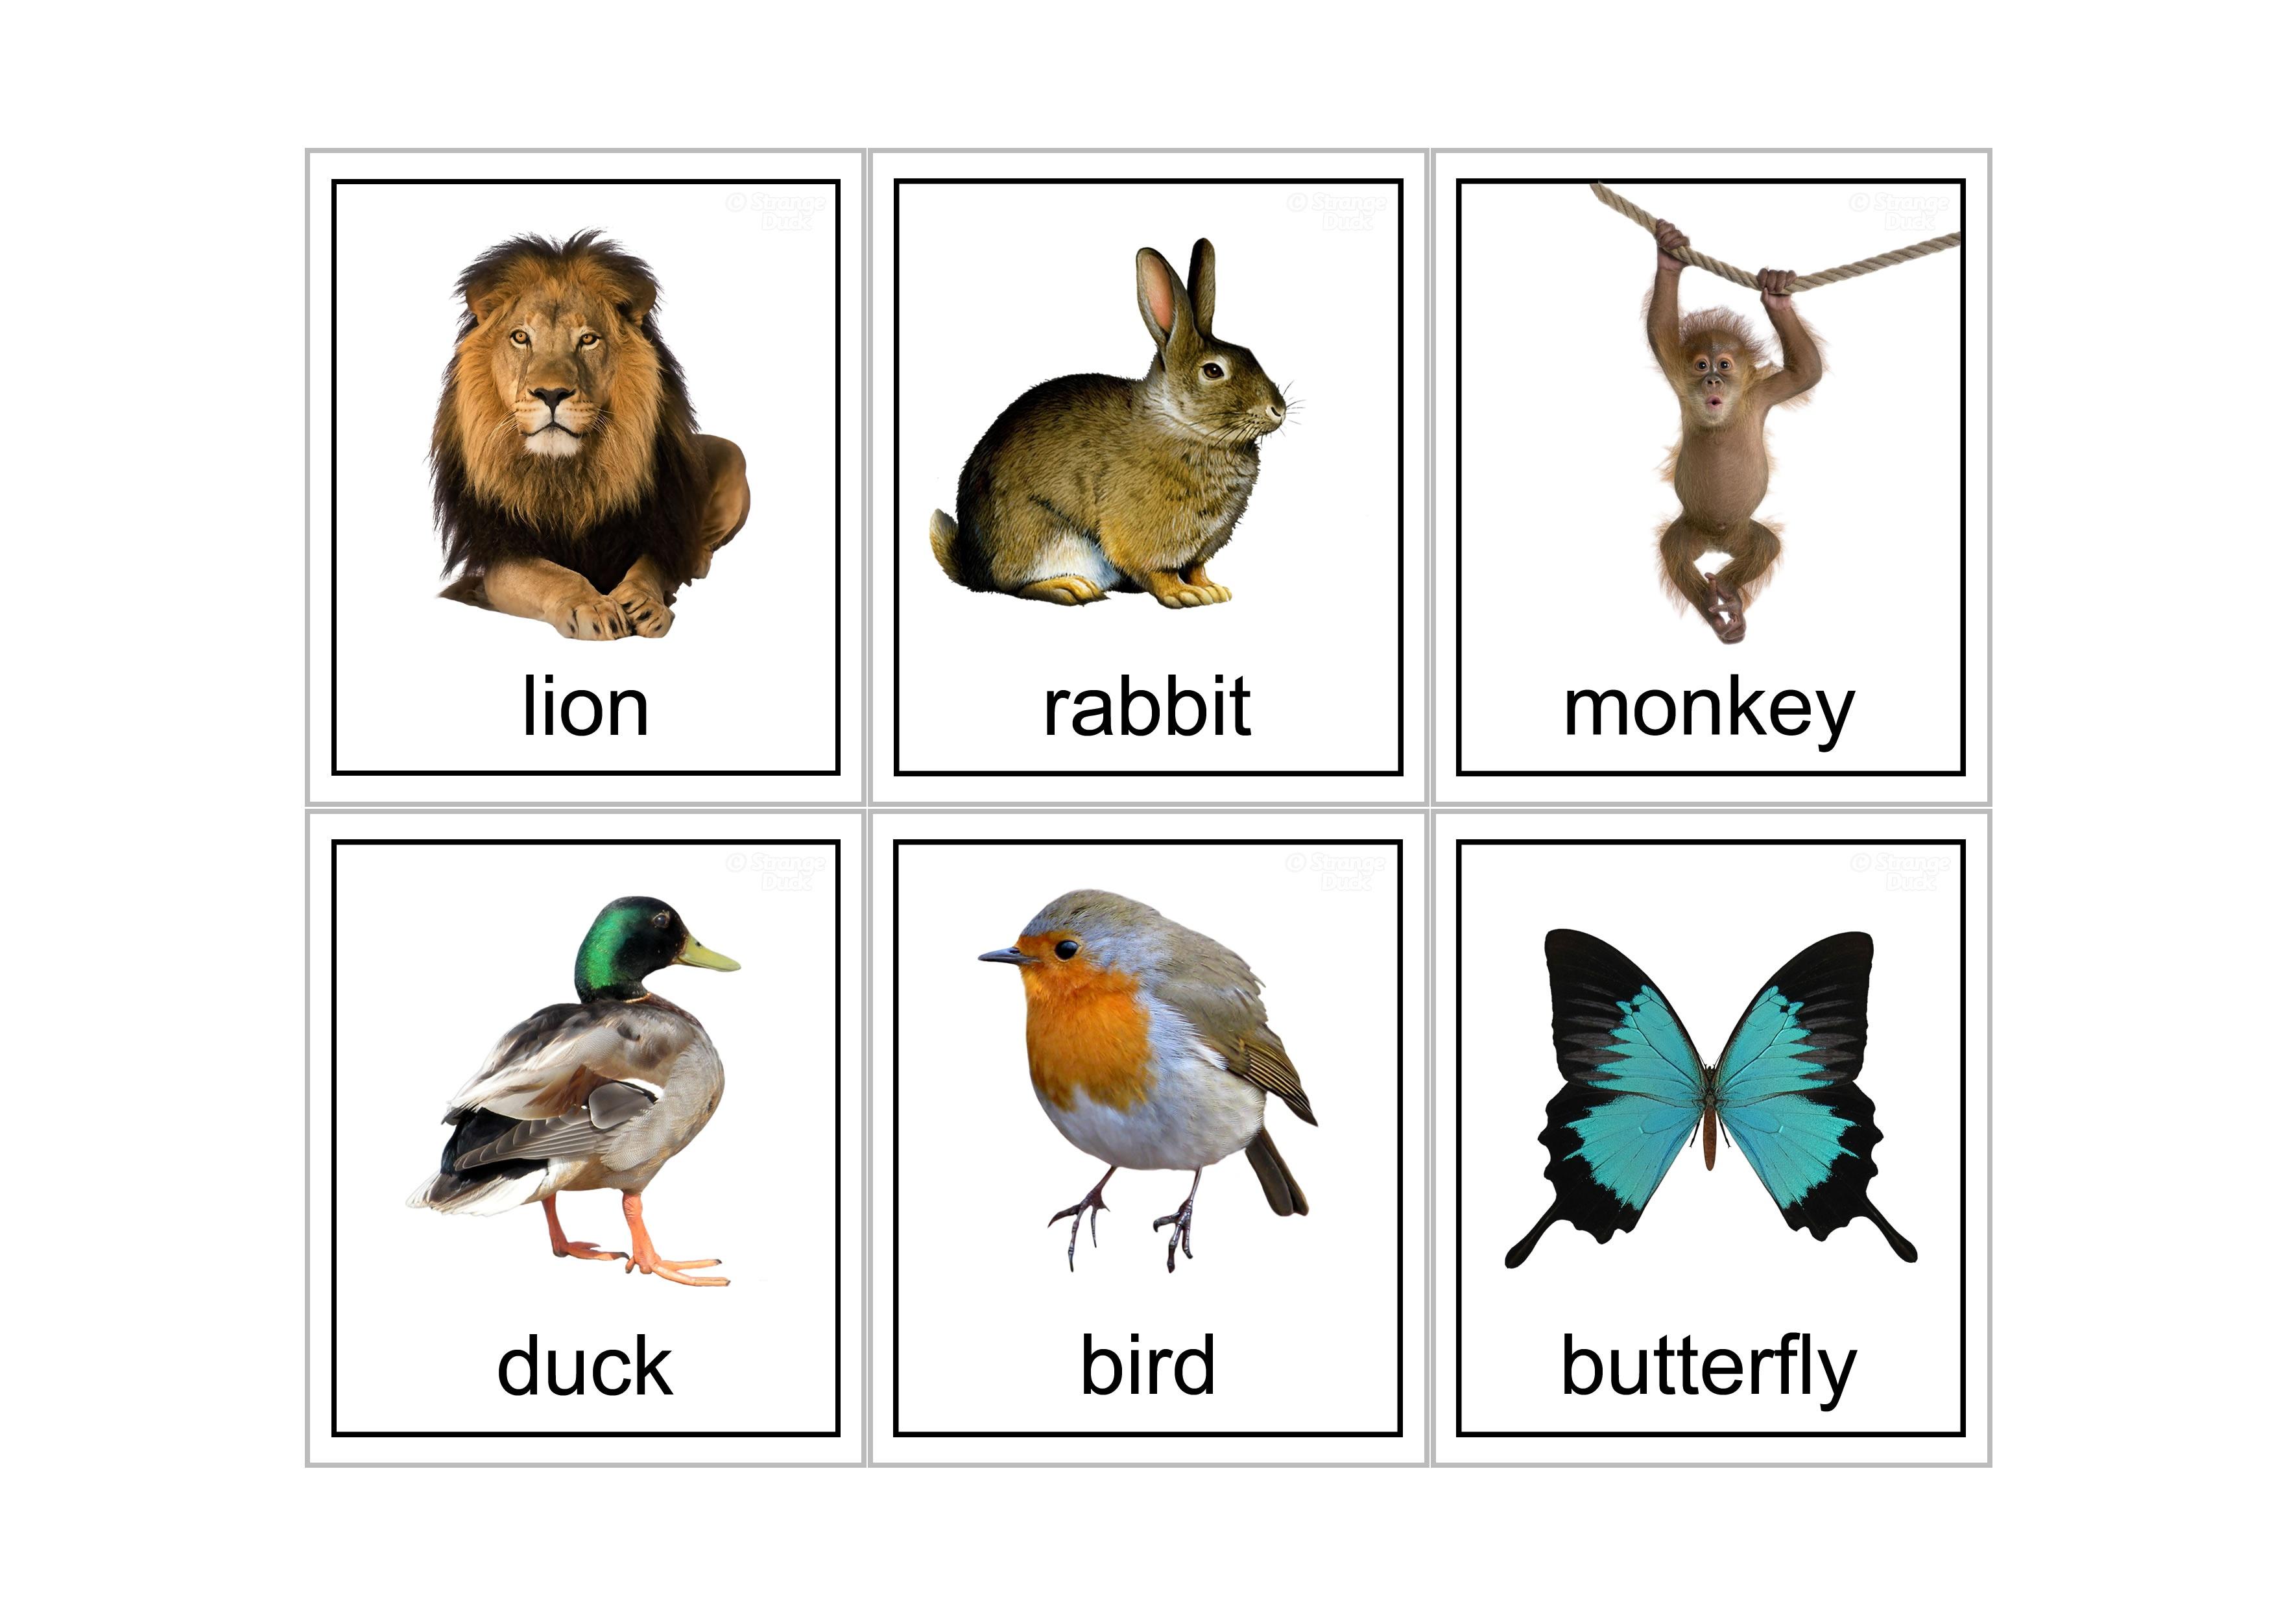 15 Animal Flash Cards | Kittybabylove - Free Printable Farm Animal Flash Cards